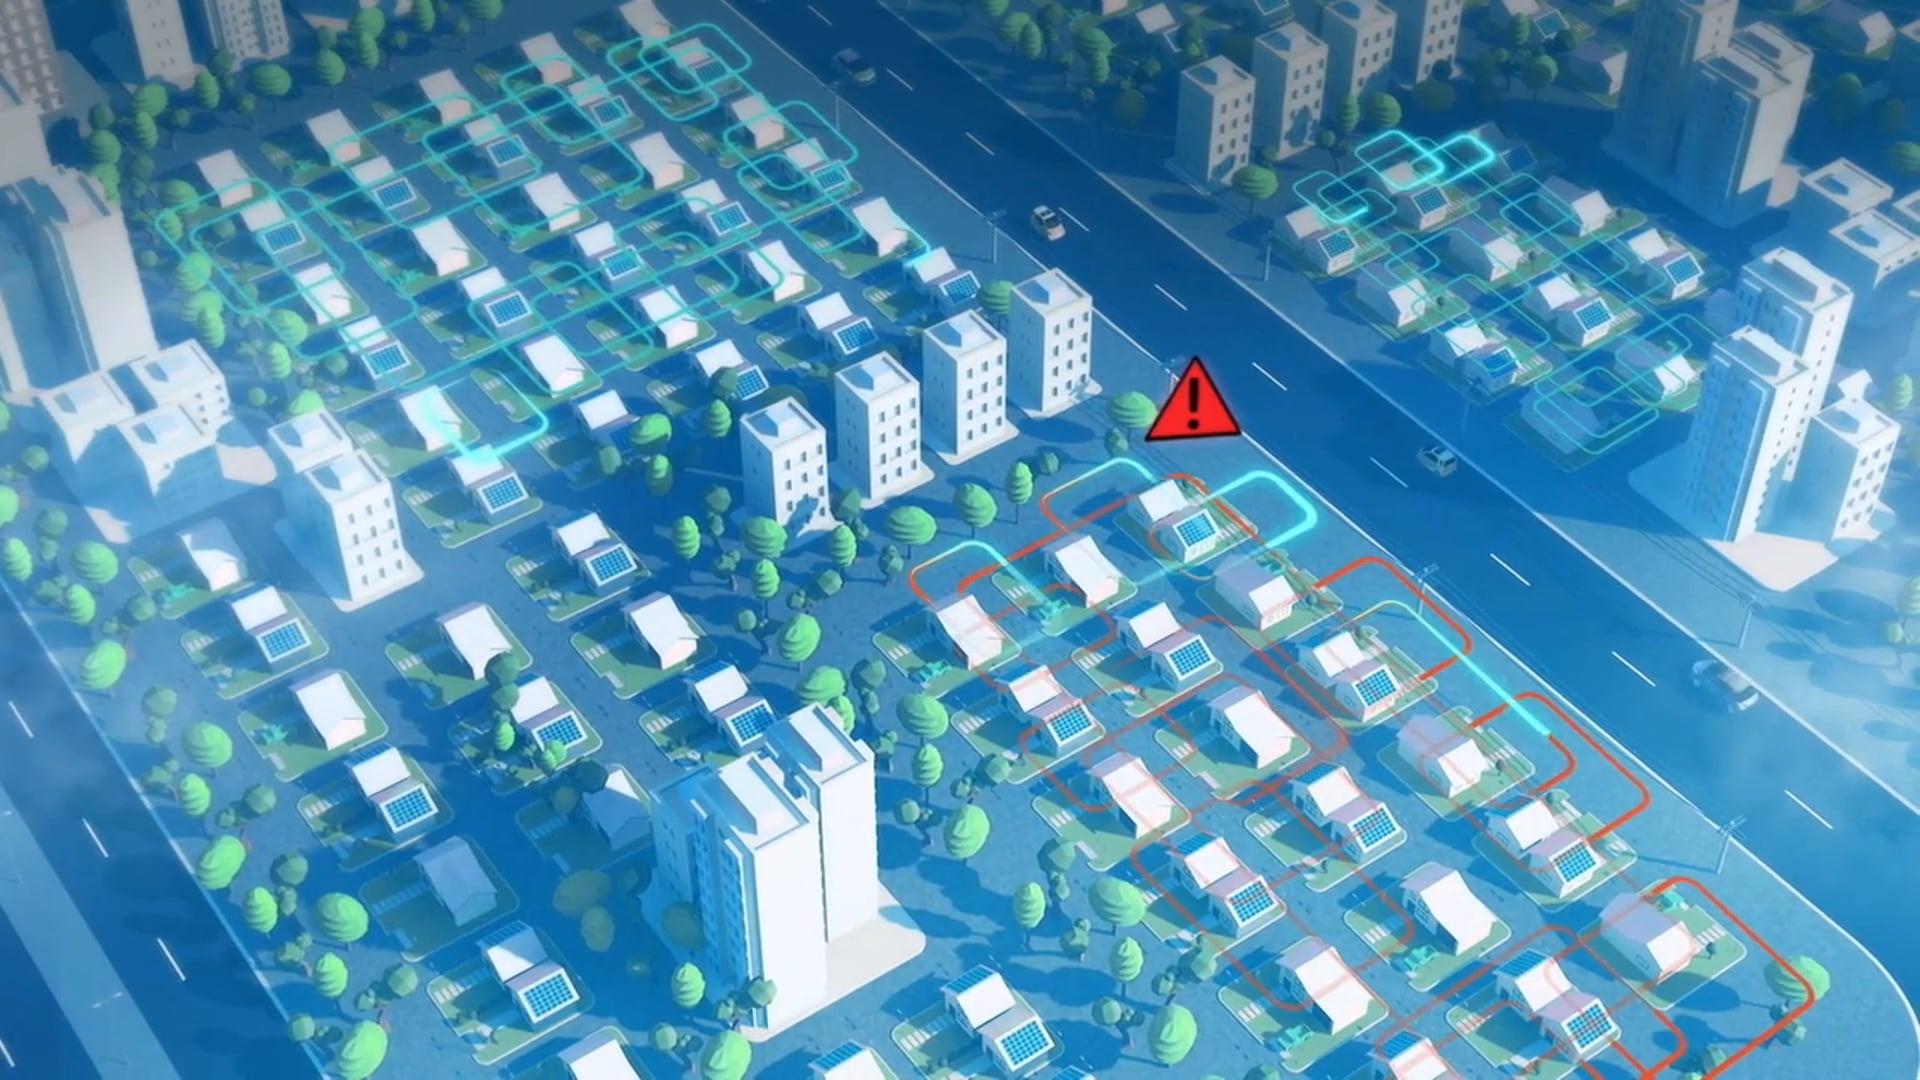 AES ELETROPAULO - Smart Grid